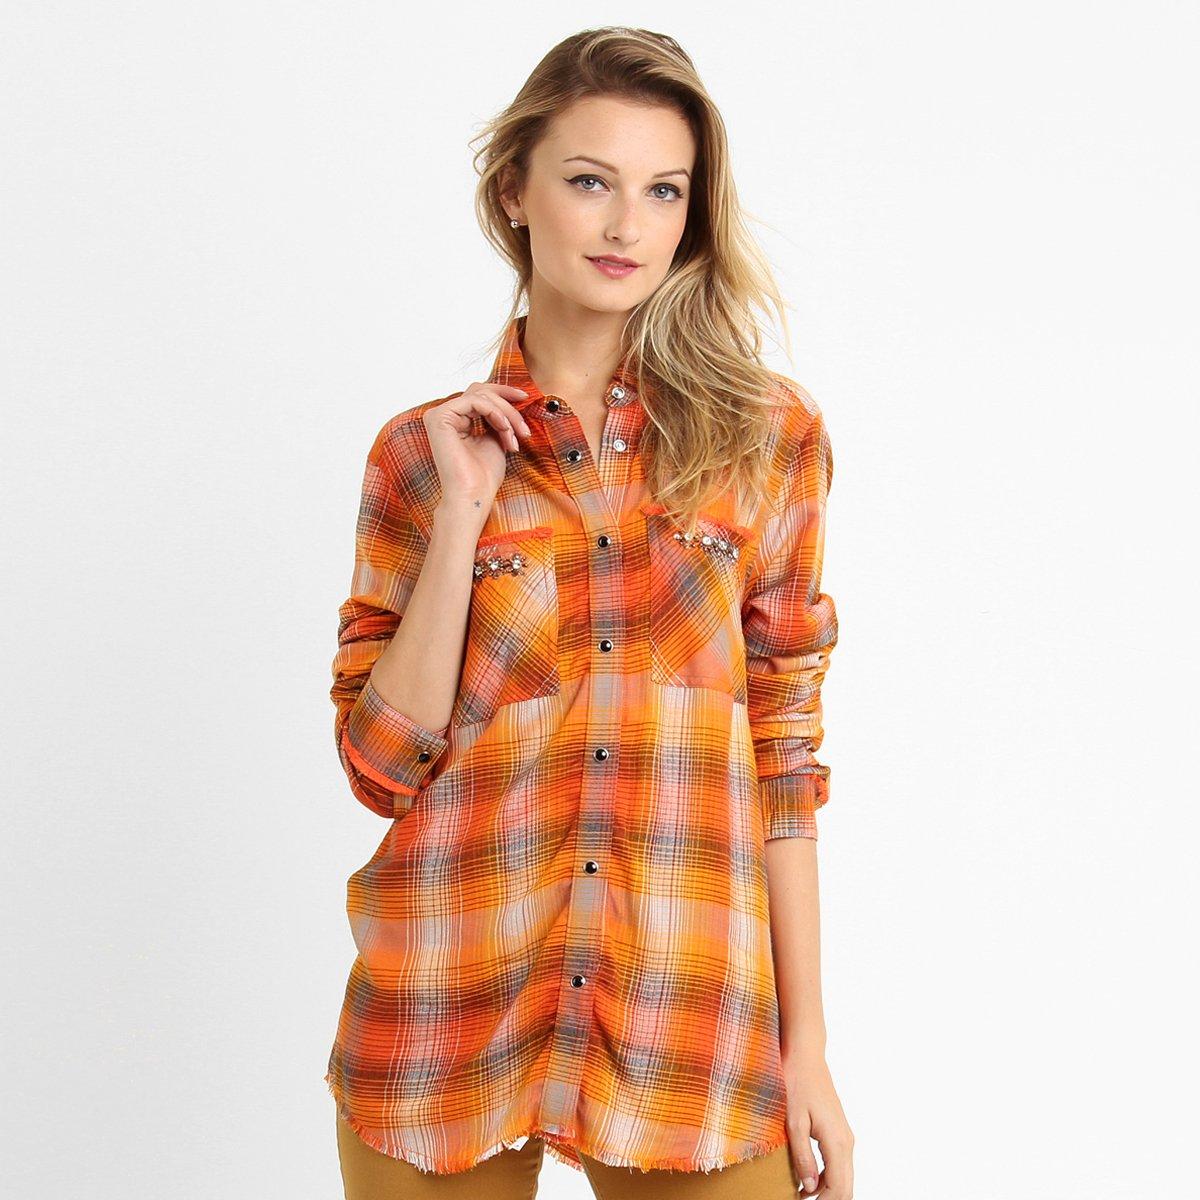 dc08afa93ab0e Camisa Ellus Xadrez Bordada - Compre Agora